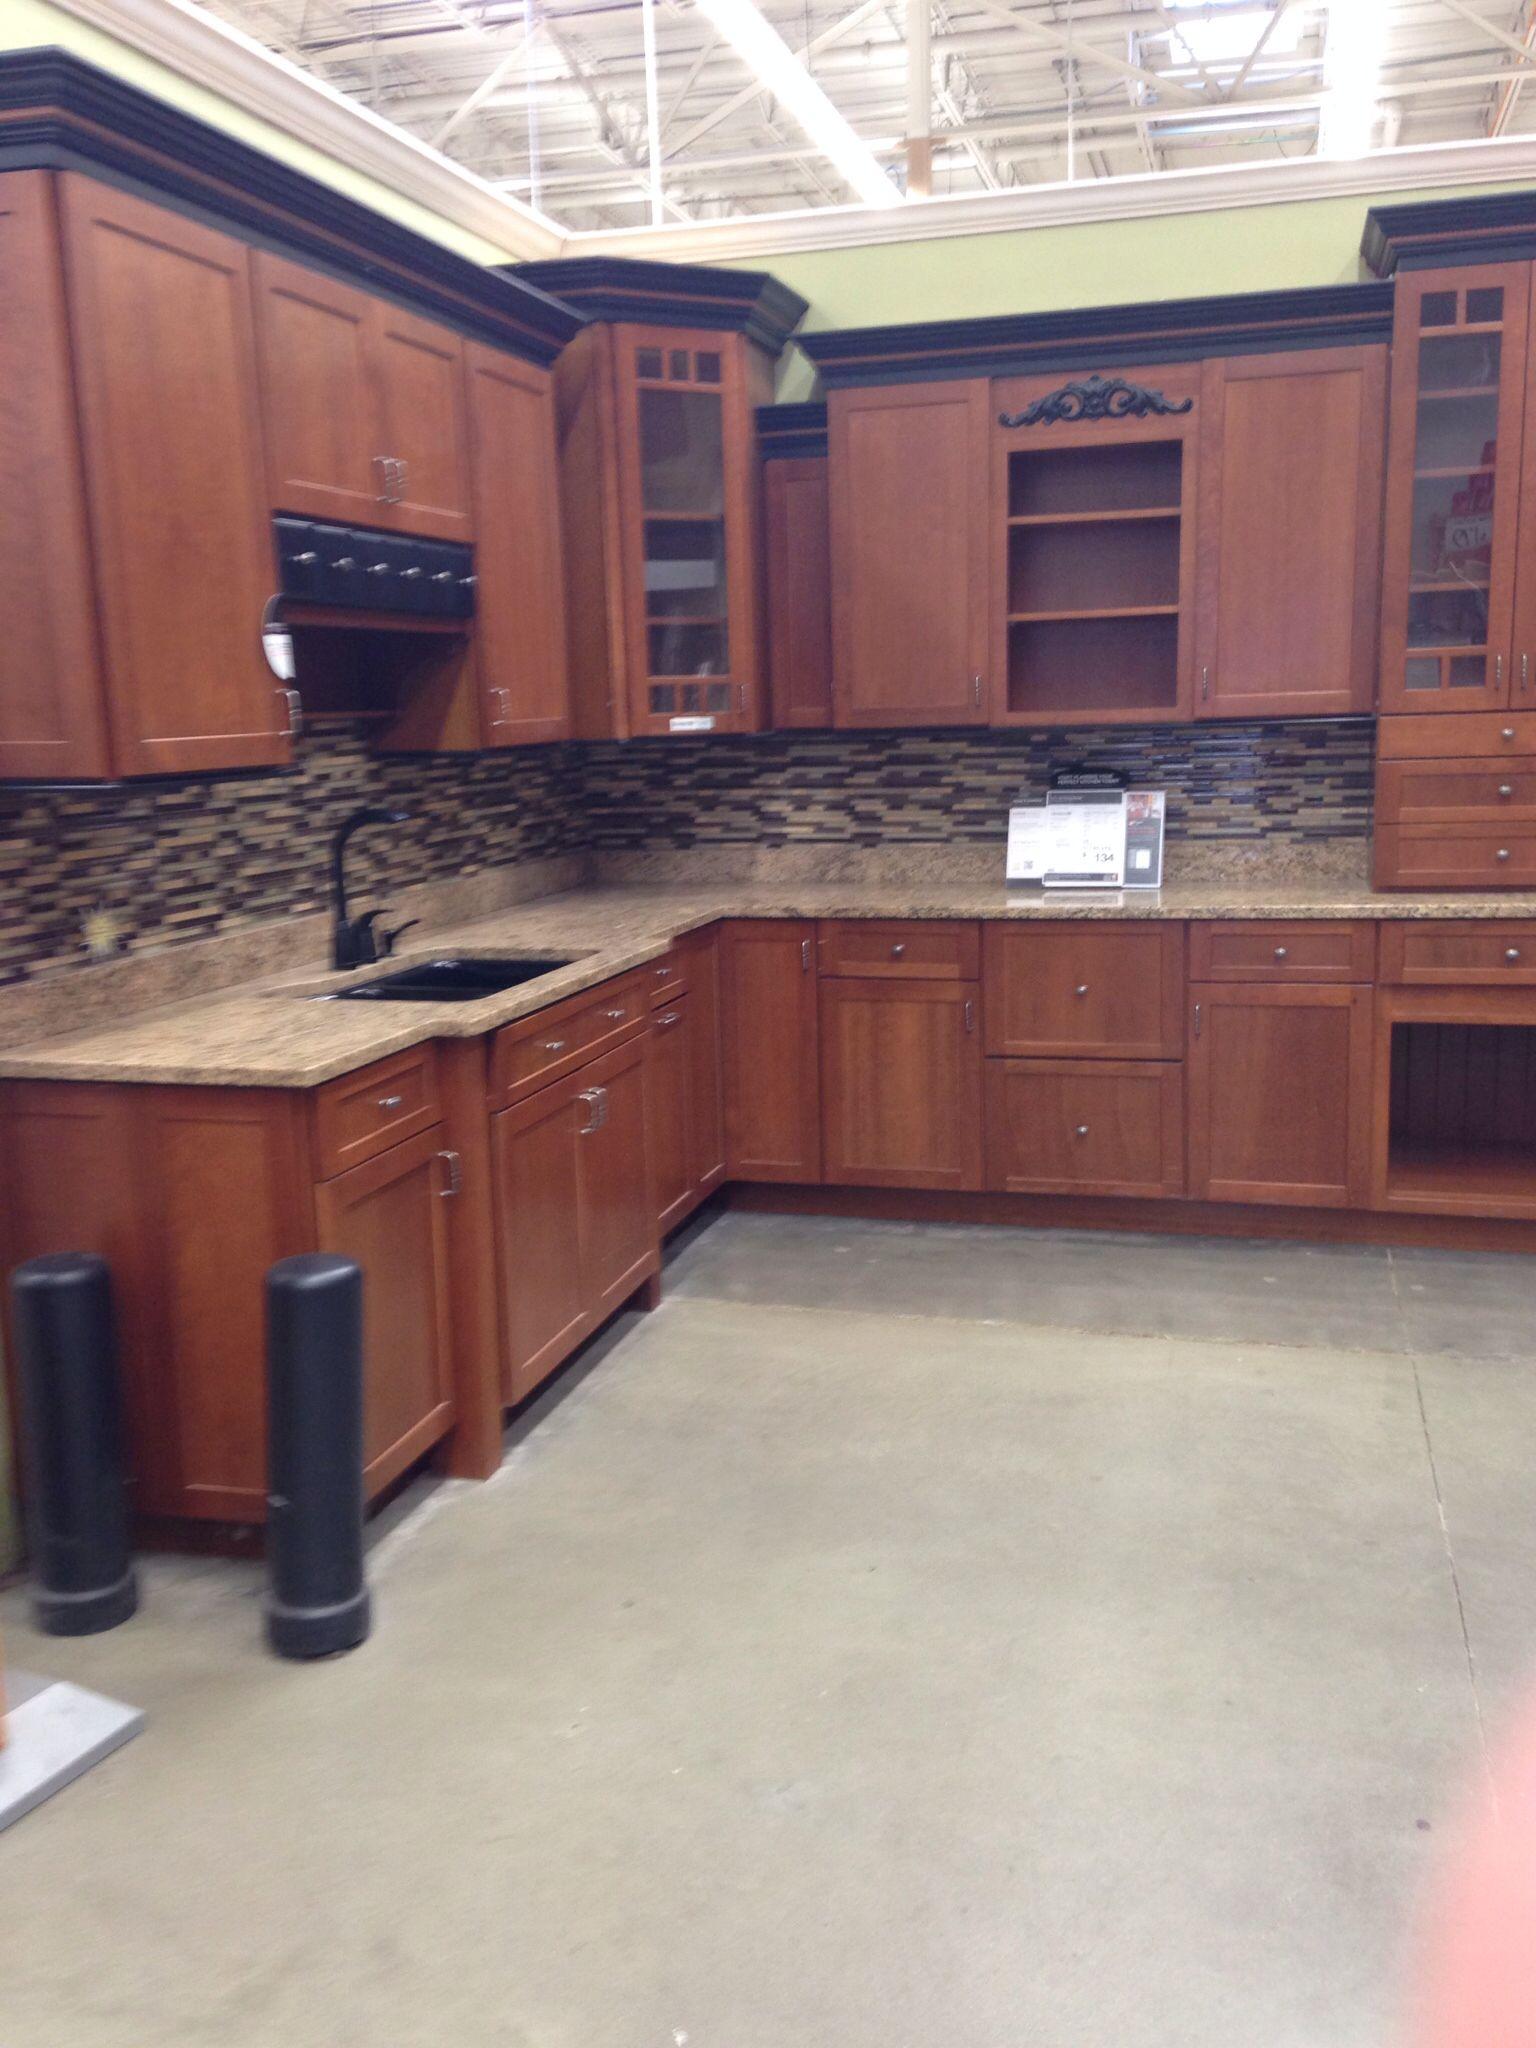 perfect kitchen cabinets at home depot kitchens pinterest. Black Bedroom Furniture Sets. Home Design Ideas